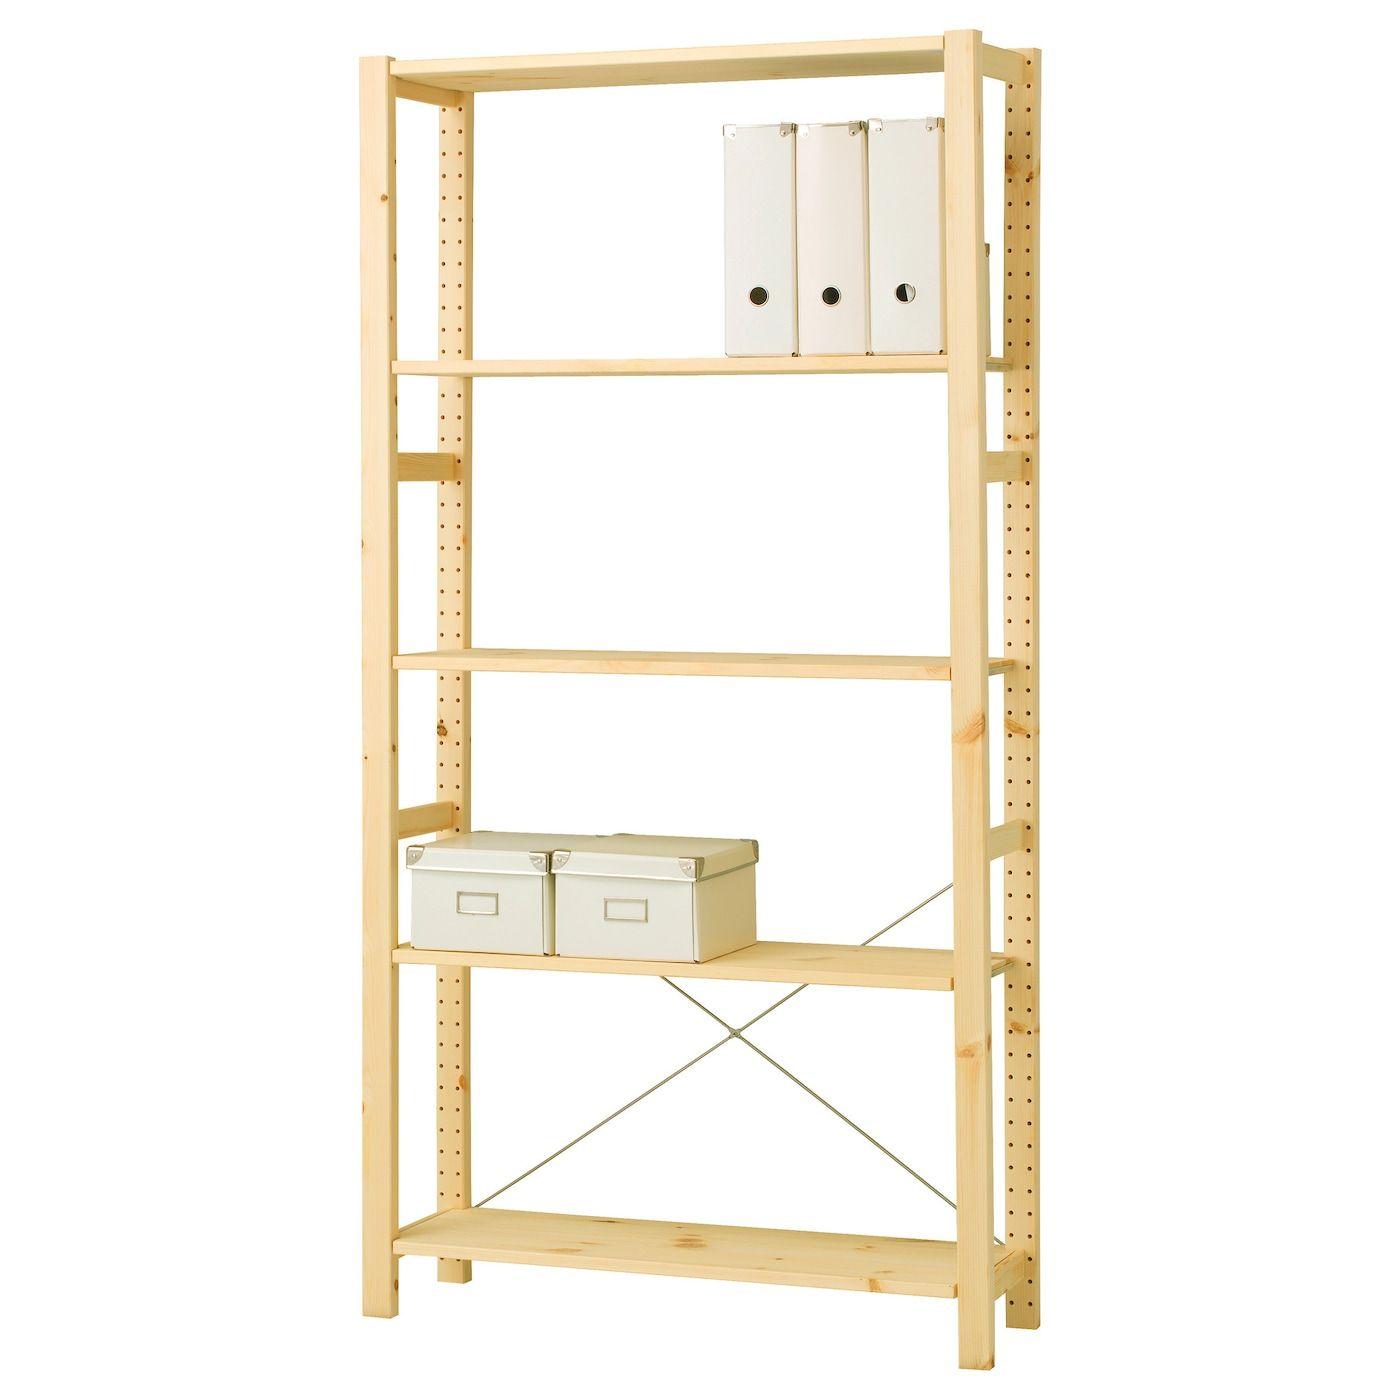 Ikea Ivar Pine Shelf Unit In 2020 Ikea Shelving Unit Shelves Ikea